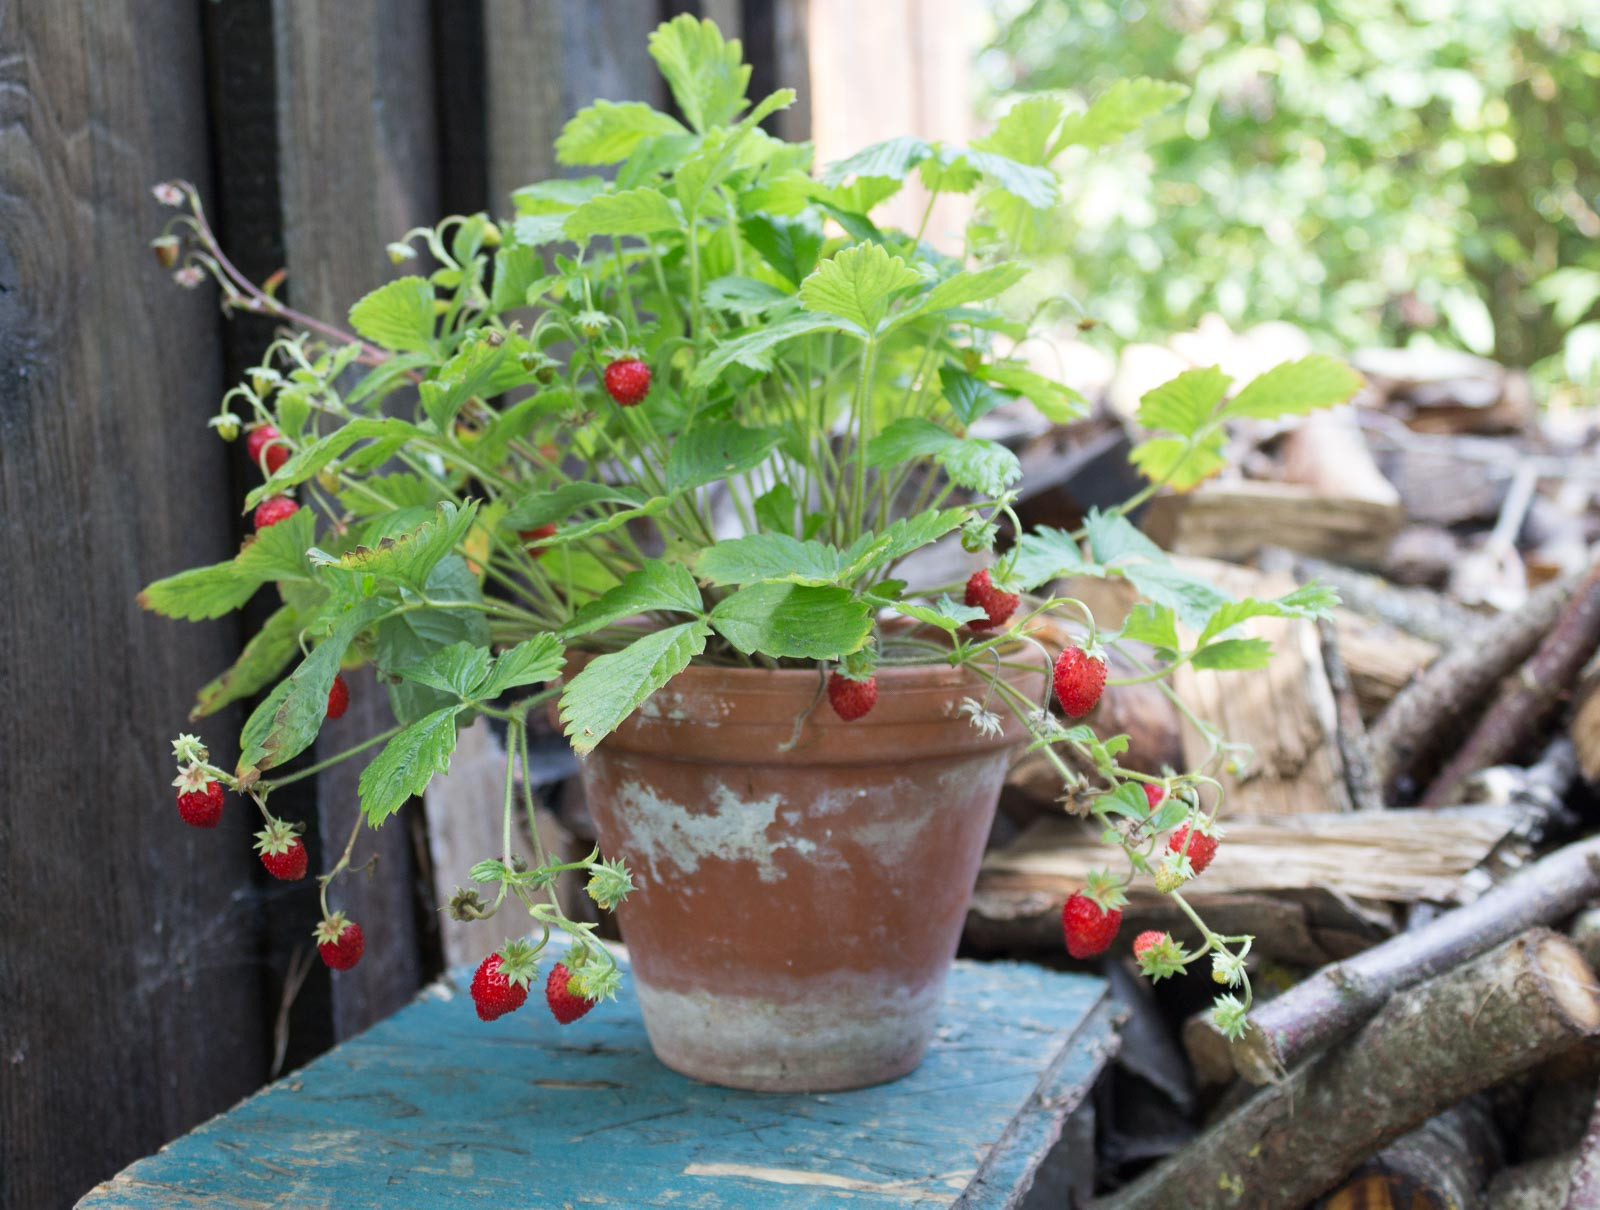 Super Alles über Erdbeeren: Egal ob Balkon oder Garten @NP_26